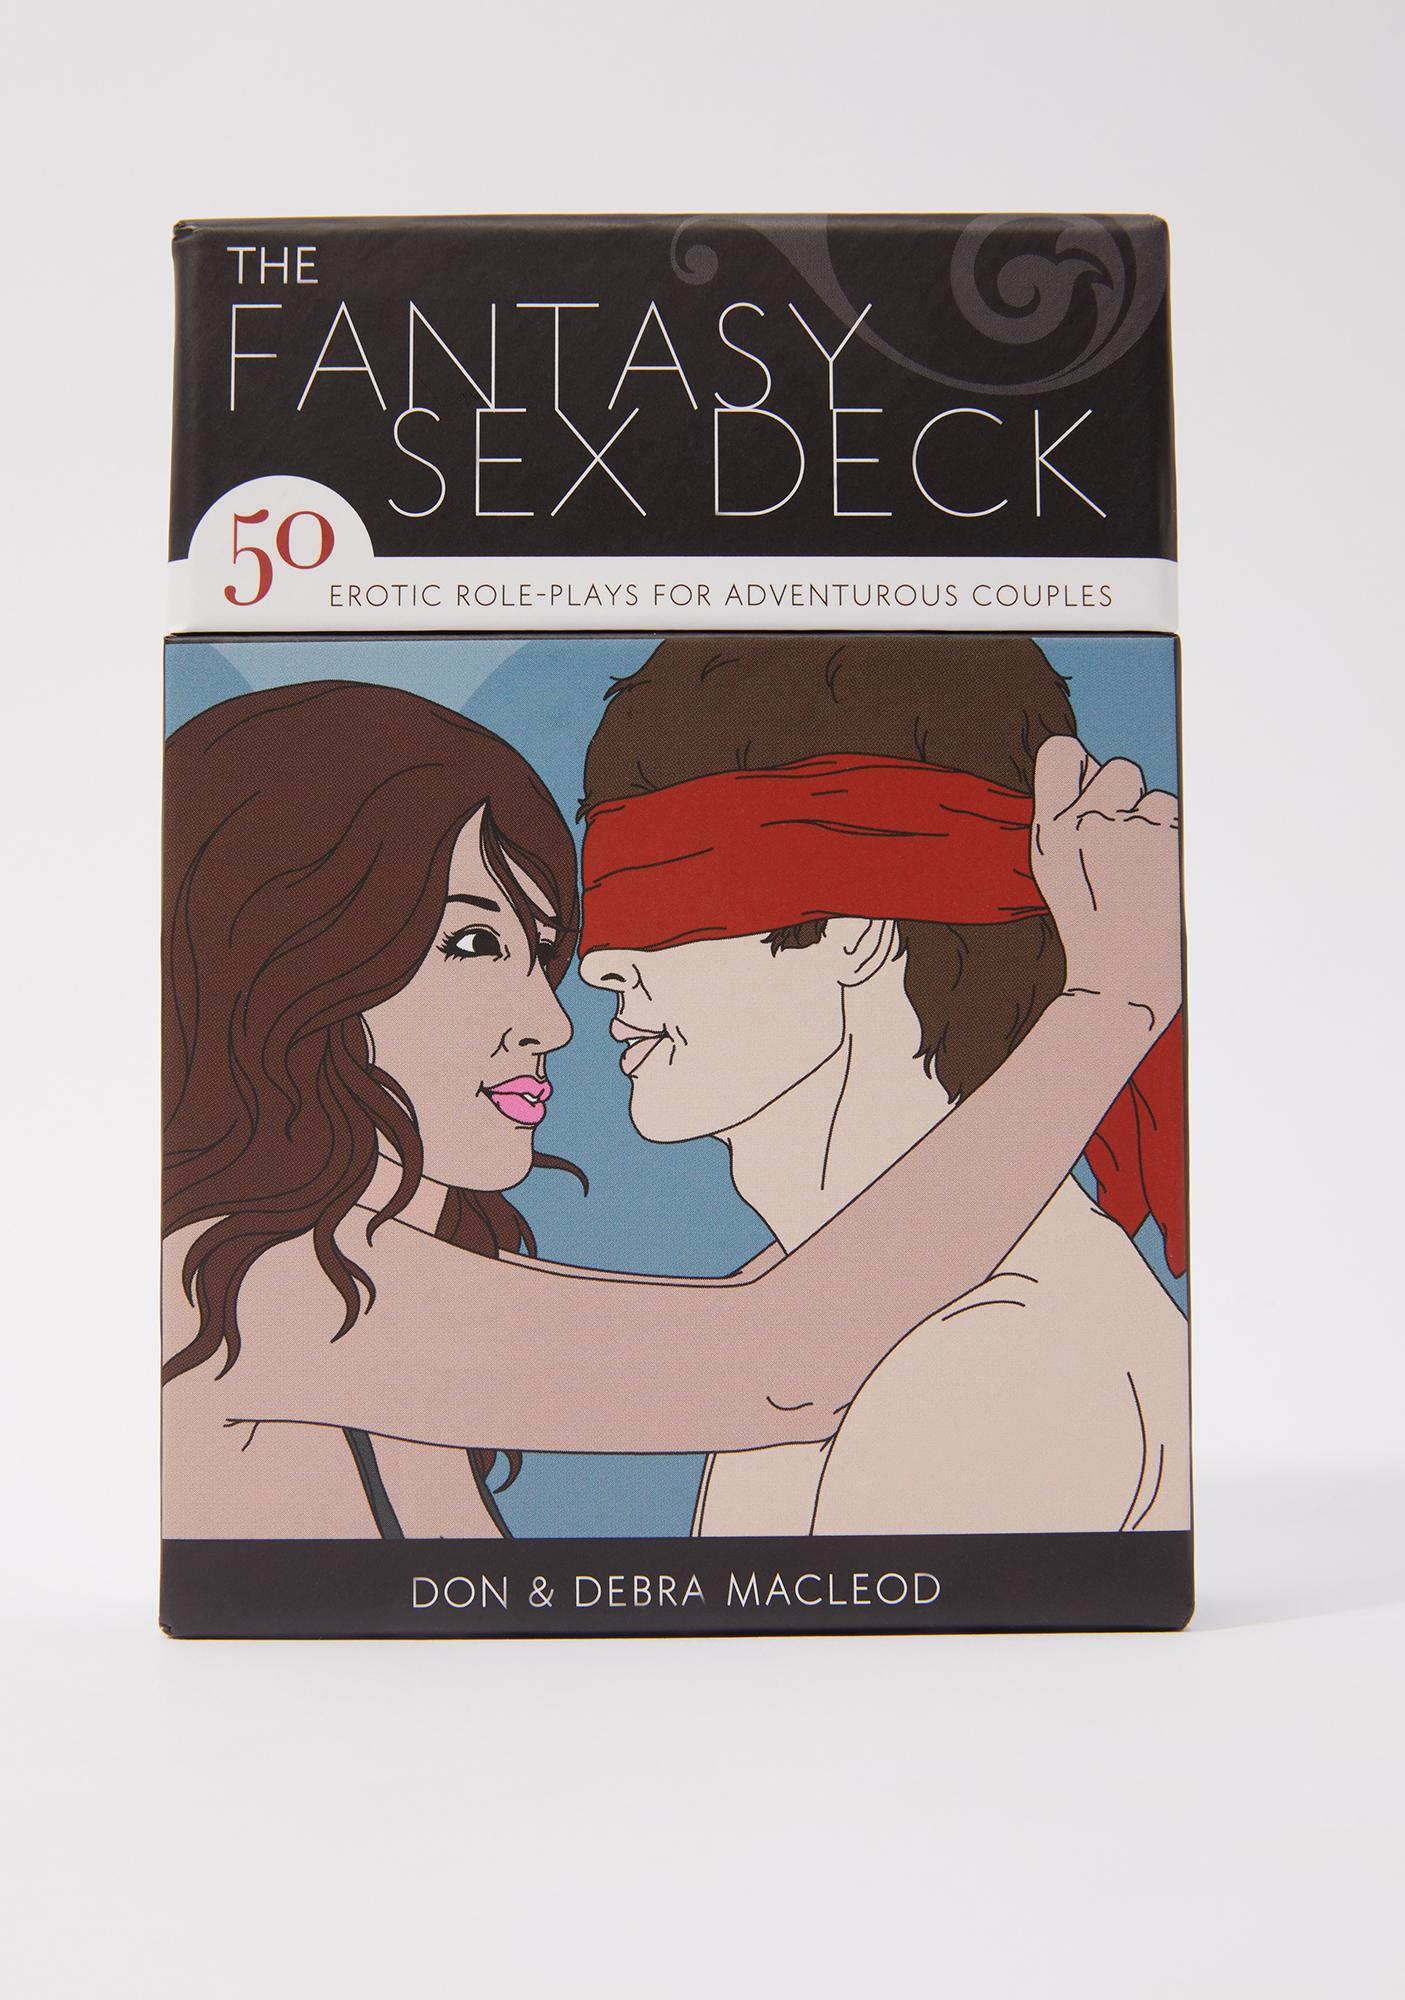 The Fantasy Sex Deck